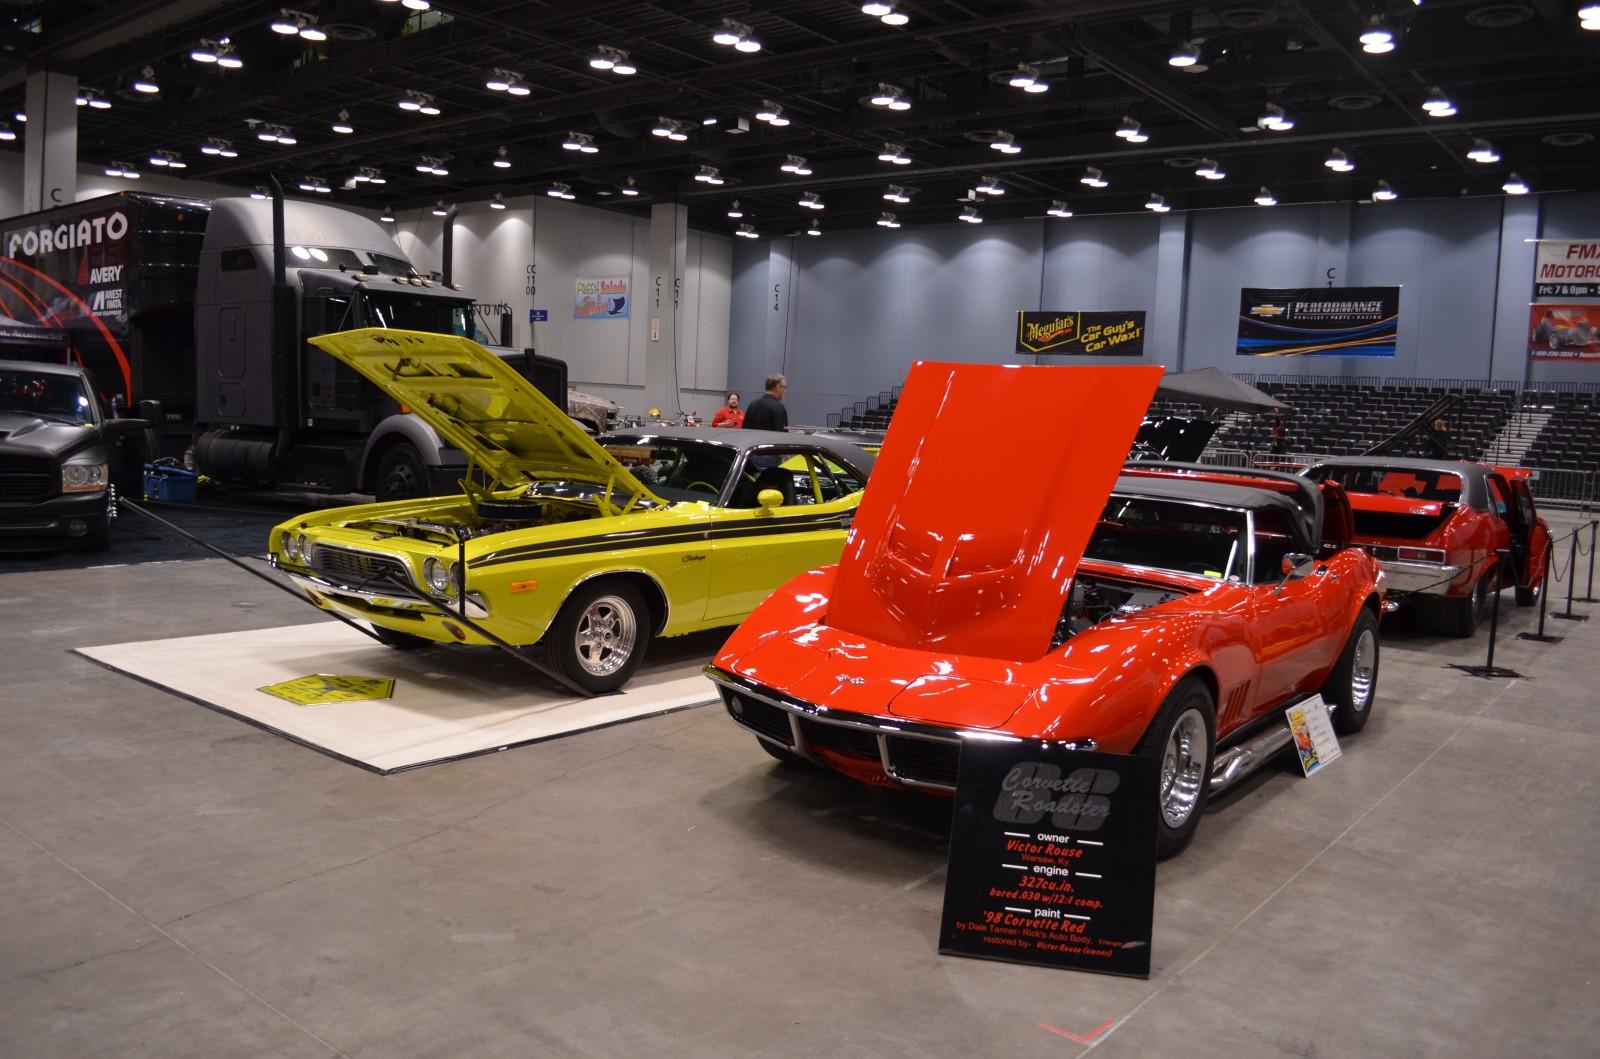 Cincinnati Car Show: Cincinnati Car Shows 2014.html